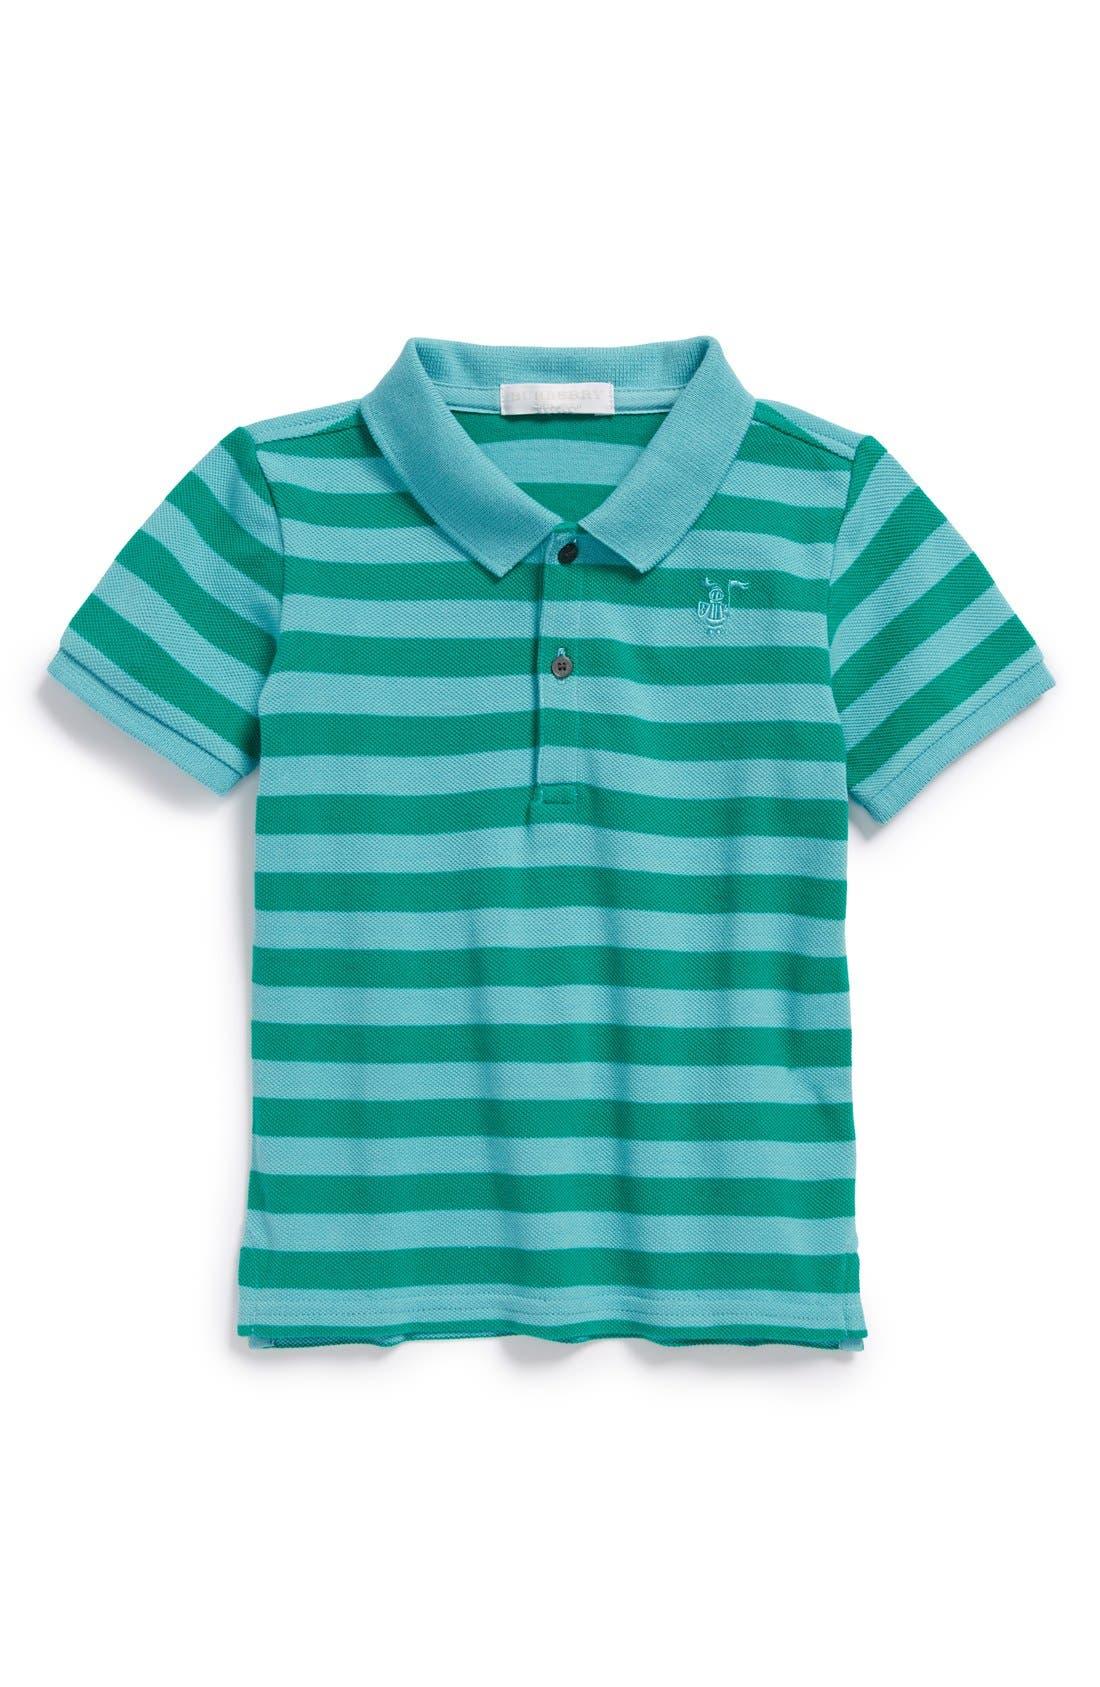 Main Image - Burberry Stripe Polo (Toddler Boys)